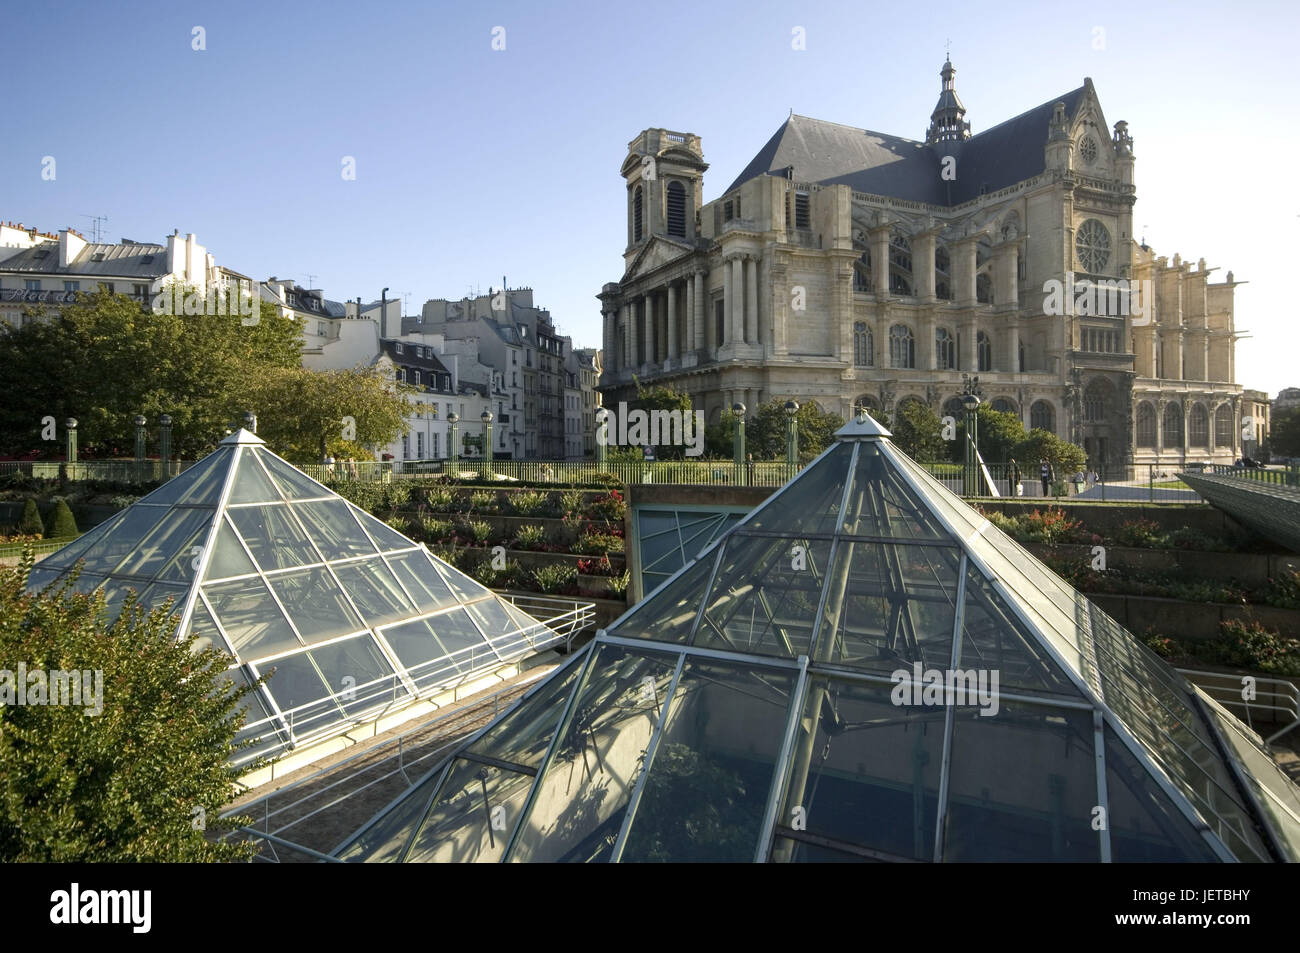 France, Paris, forum of the sound, church Saint Eustache, glass pyramids, - Stock Image